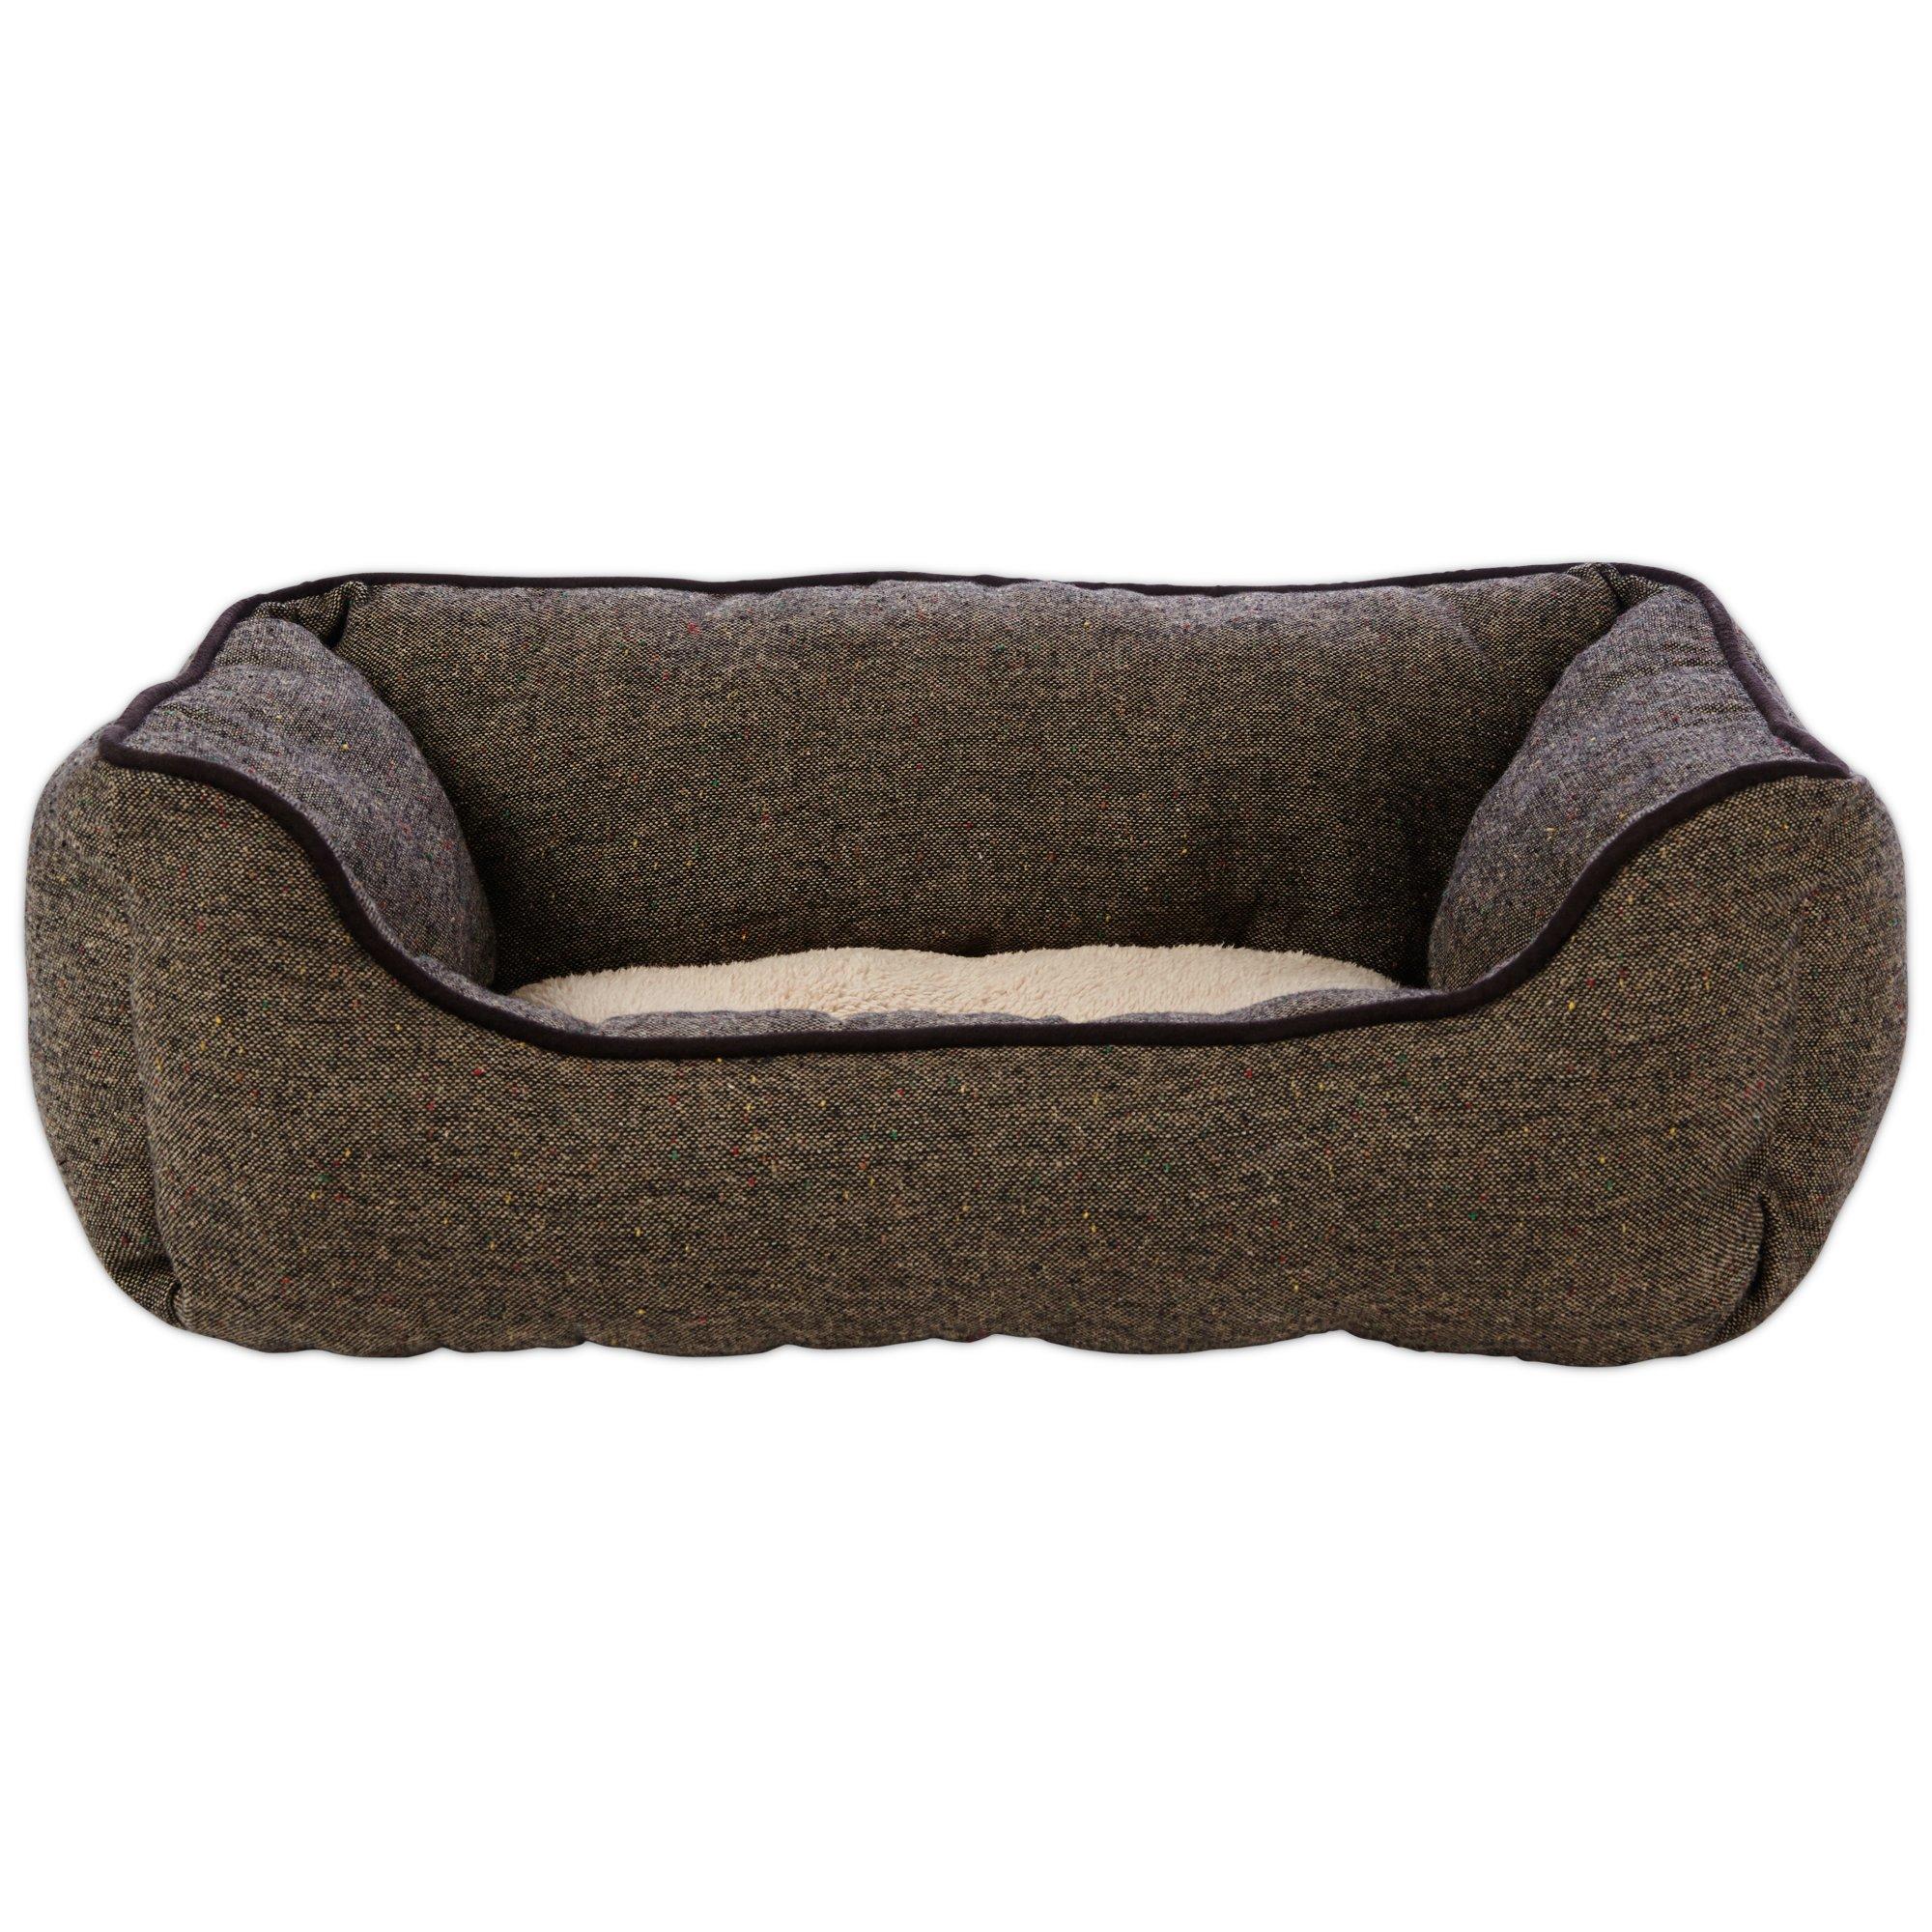 Brown Check Dog Beds